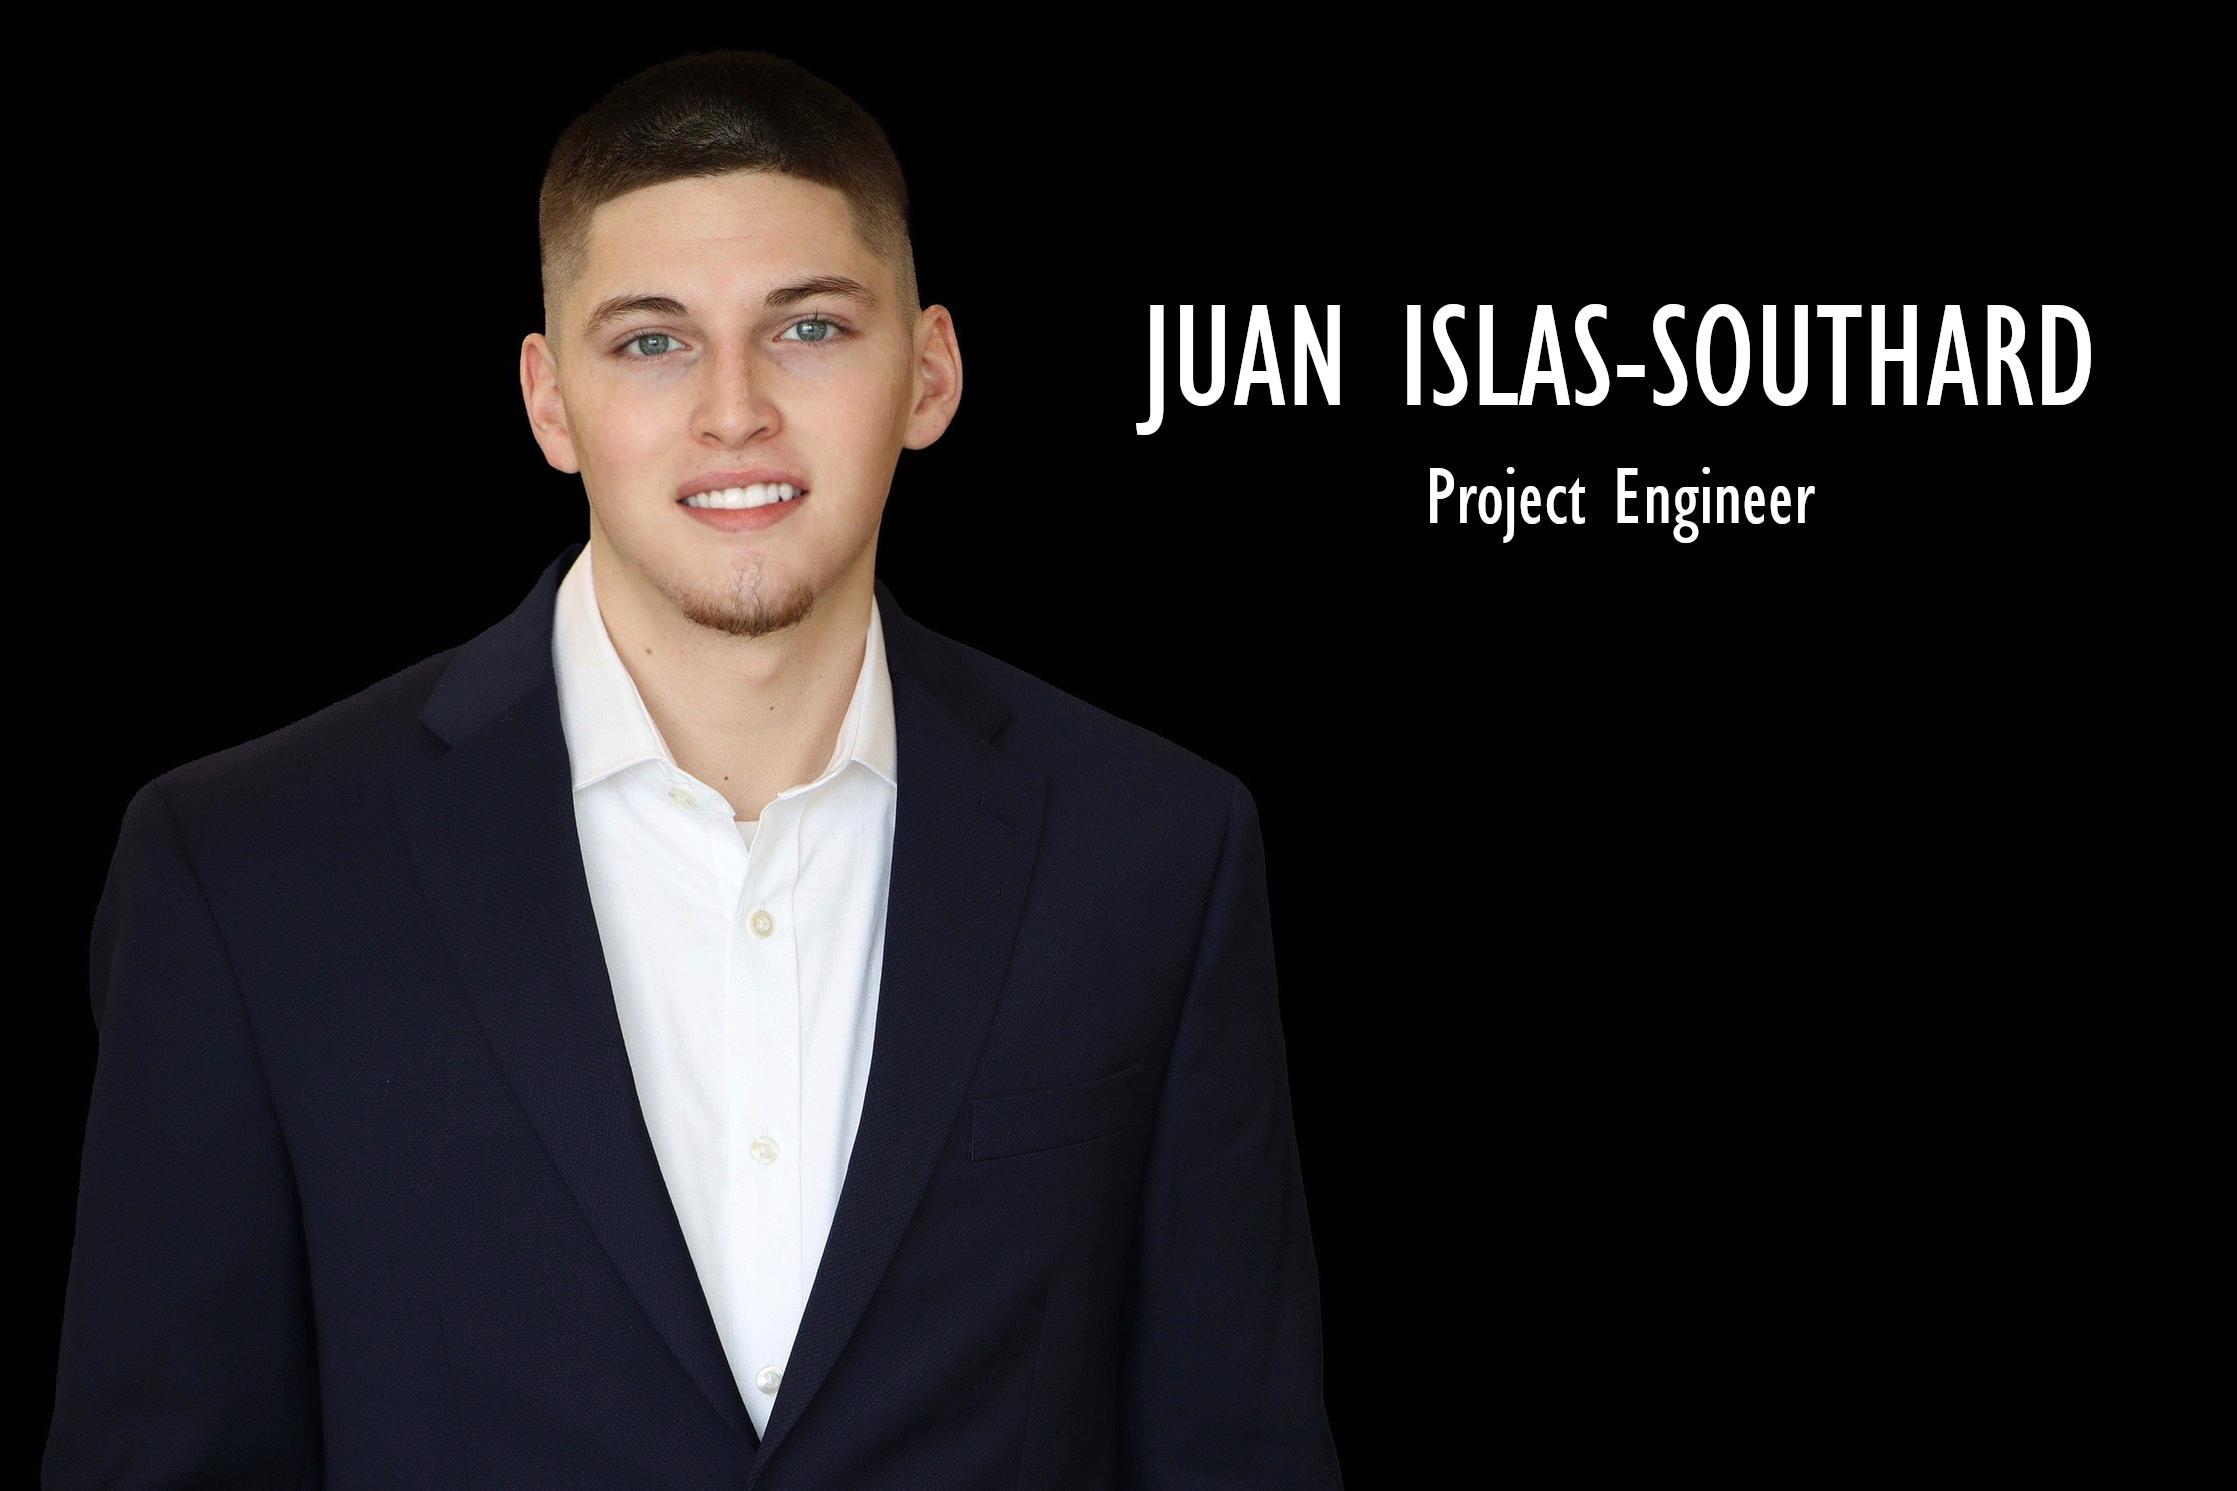 Juan Islas